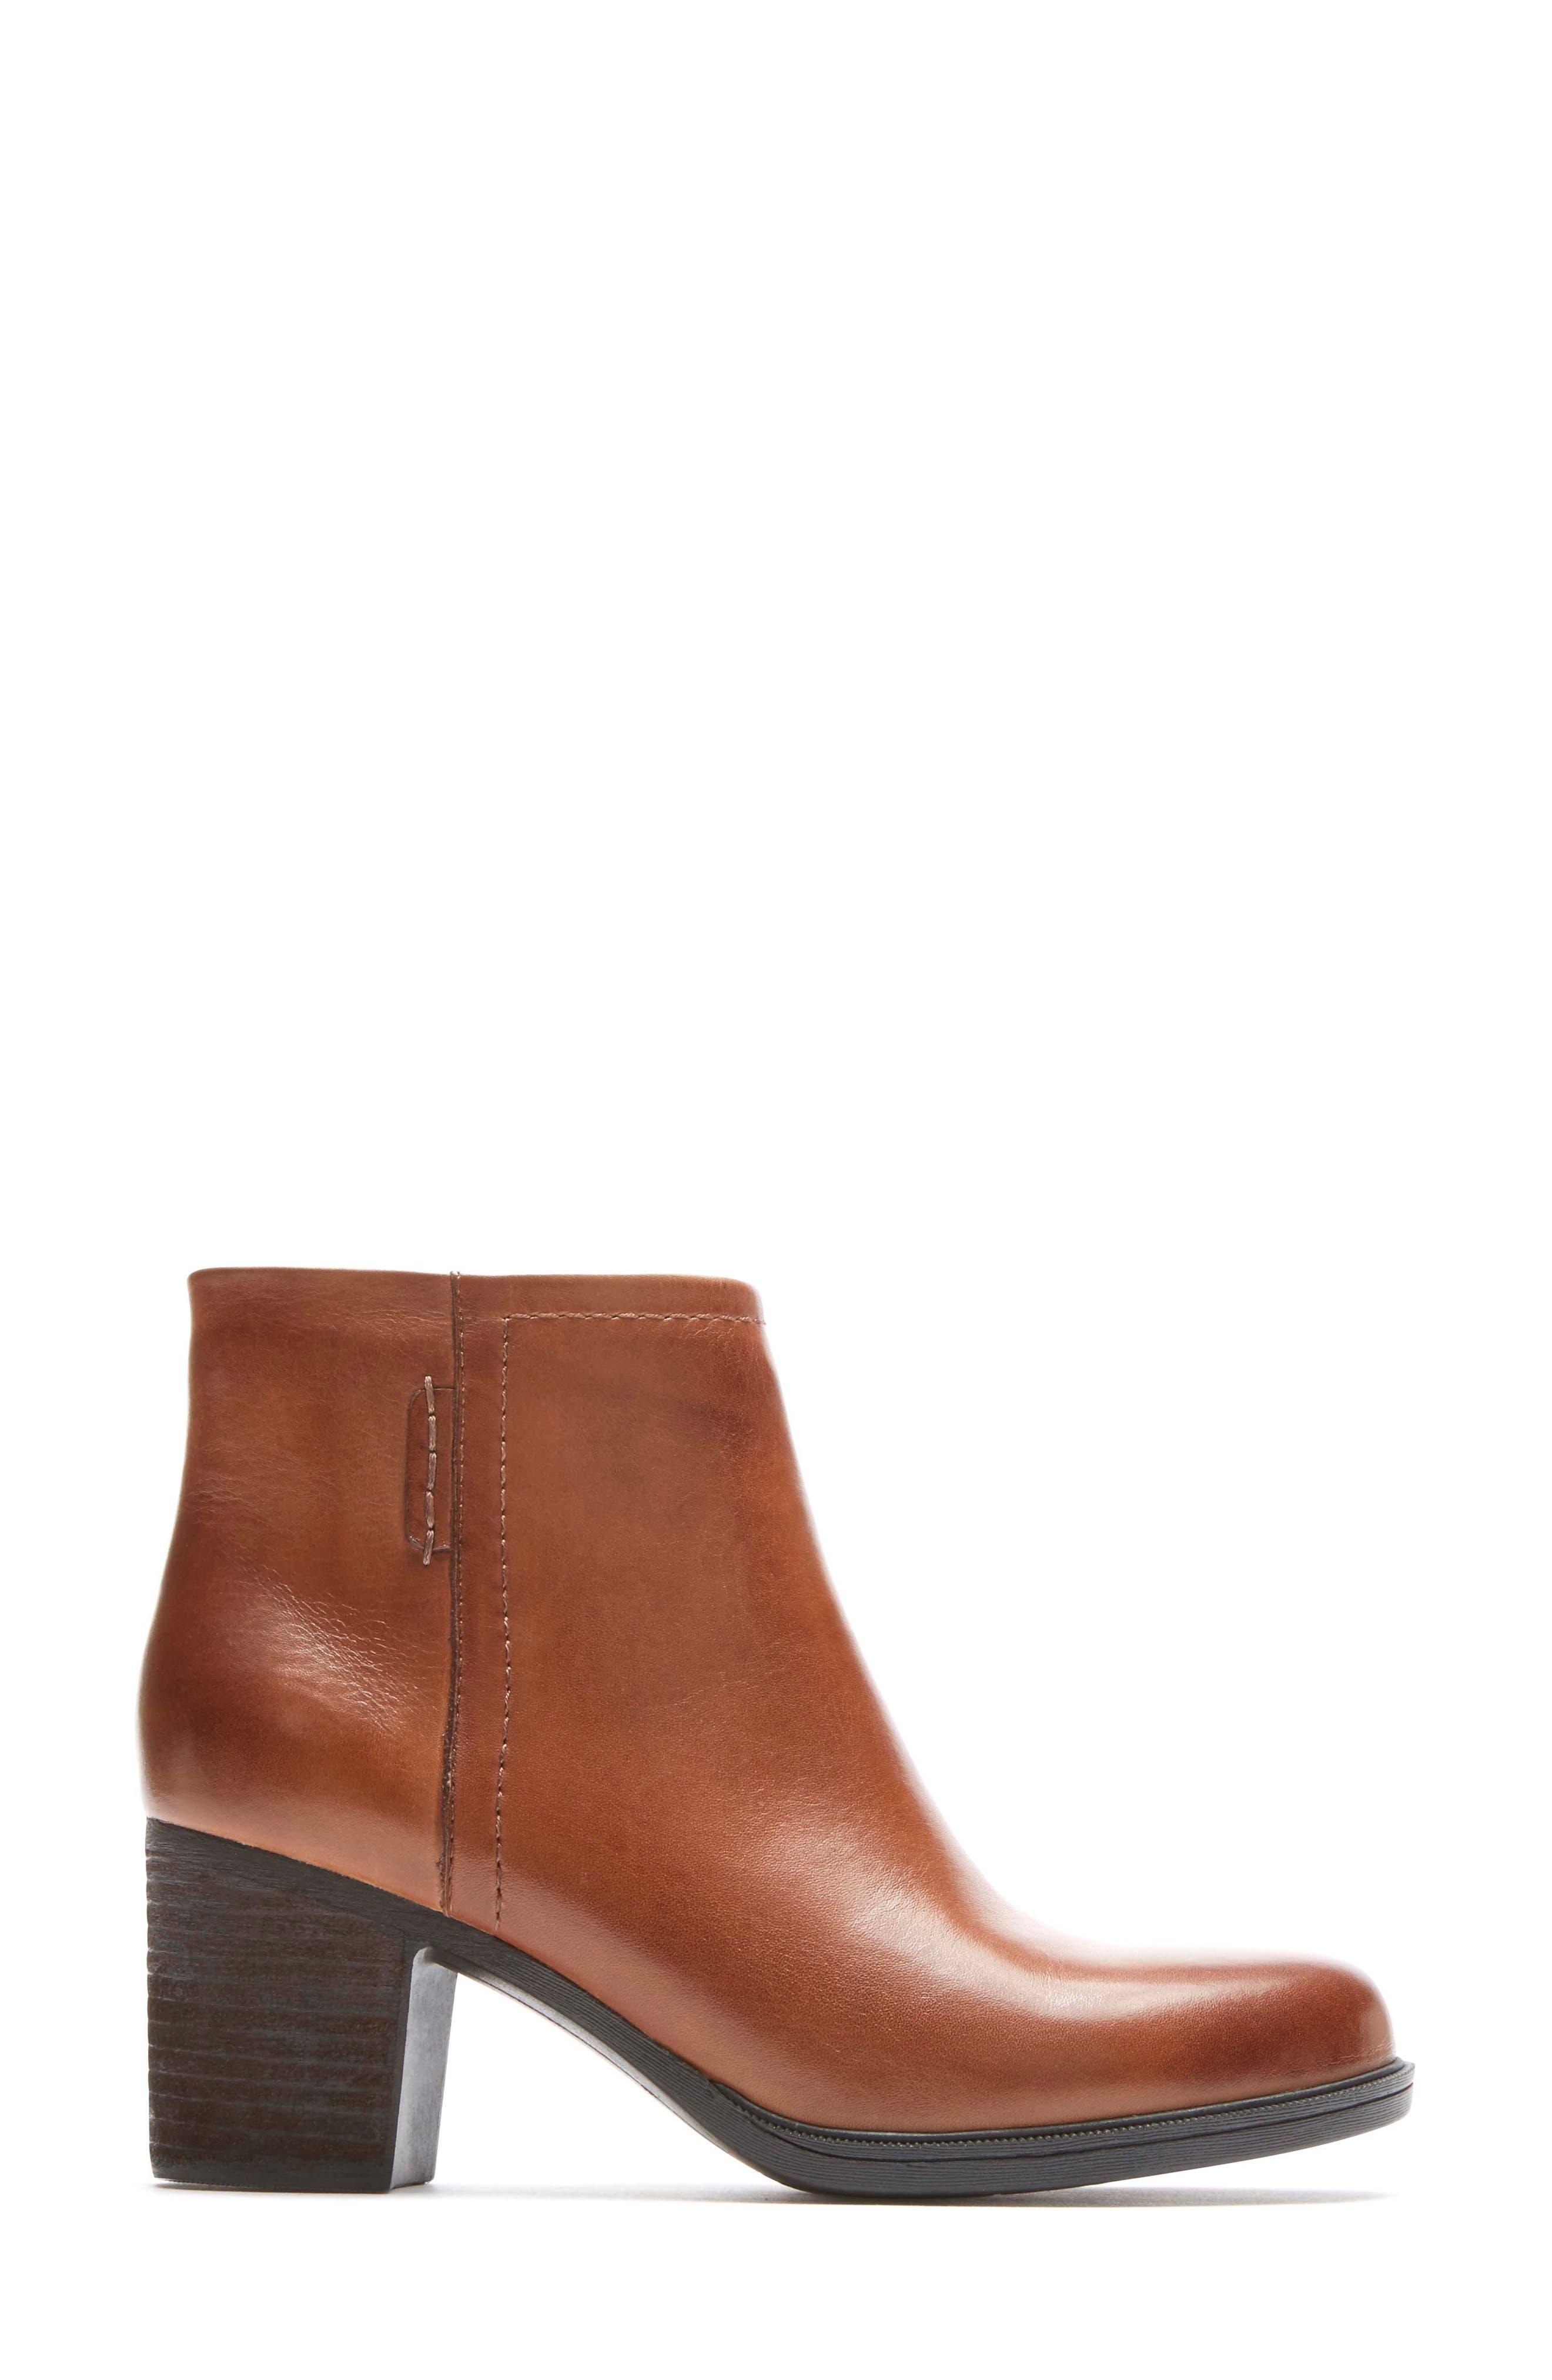 Natashya Bootie,                             Alternate thumbnail 3, color,                             Almond Leather